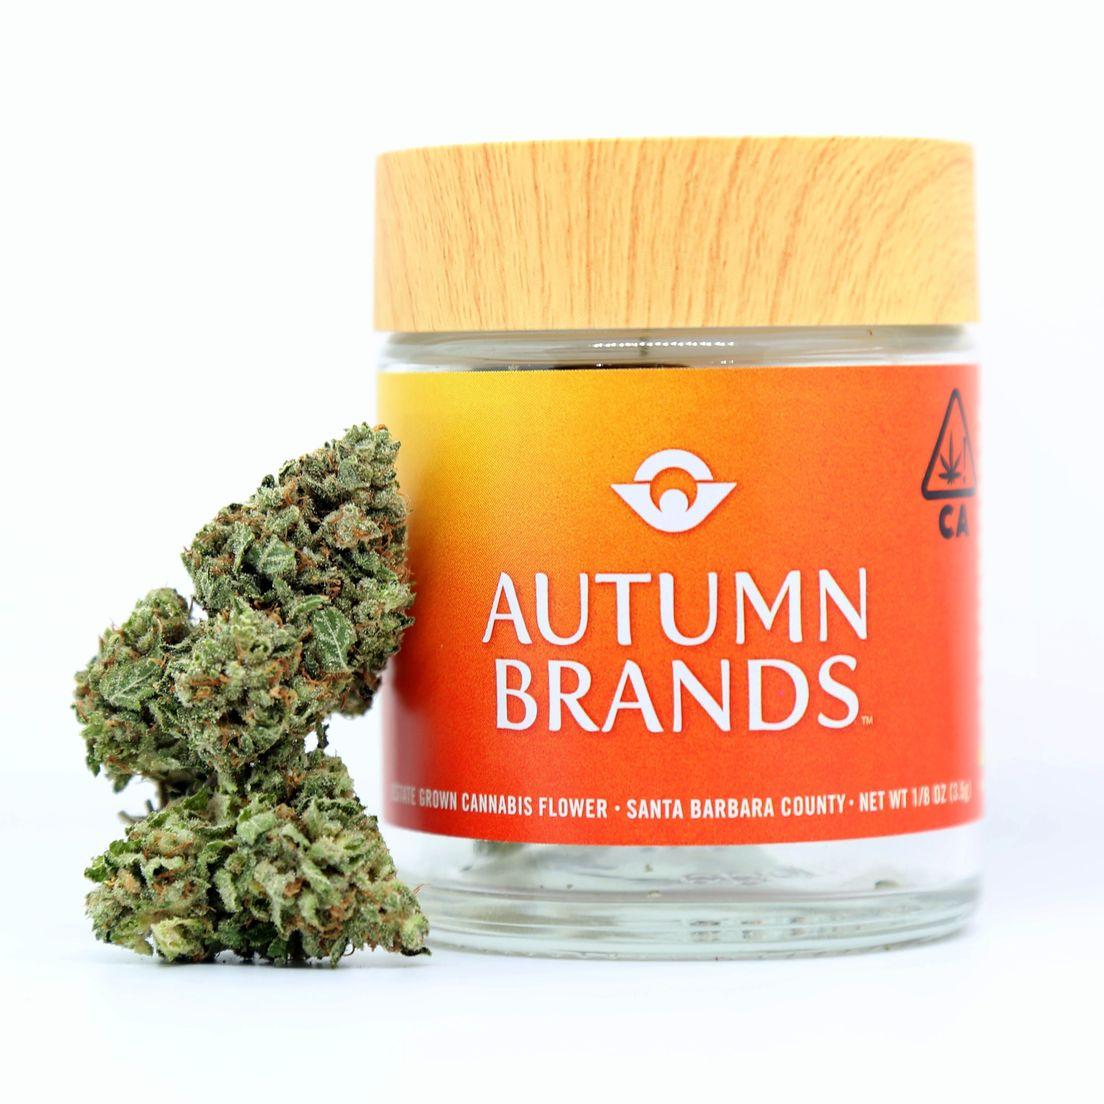 B. Autumn Brands 3.5g Flower - Quality 8/10 - Autumn OG (~22%)